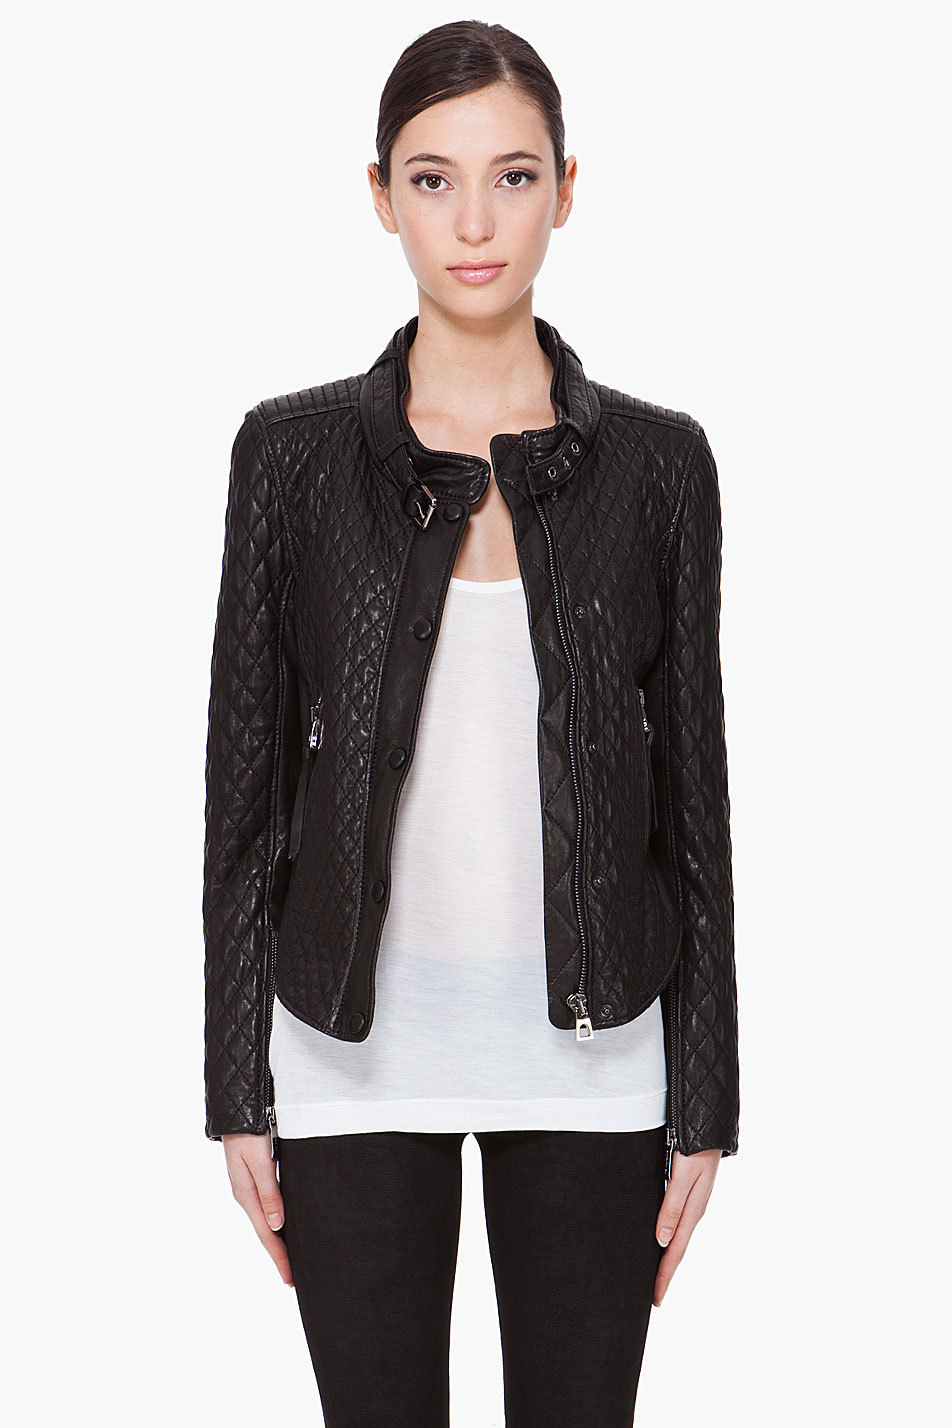 Кожаная куртка Barbara bui 21340f097001 Quilted Motorcycle цены онлайн